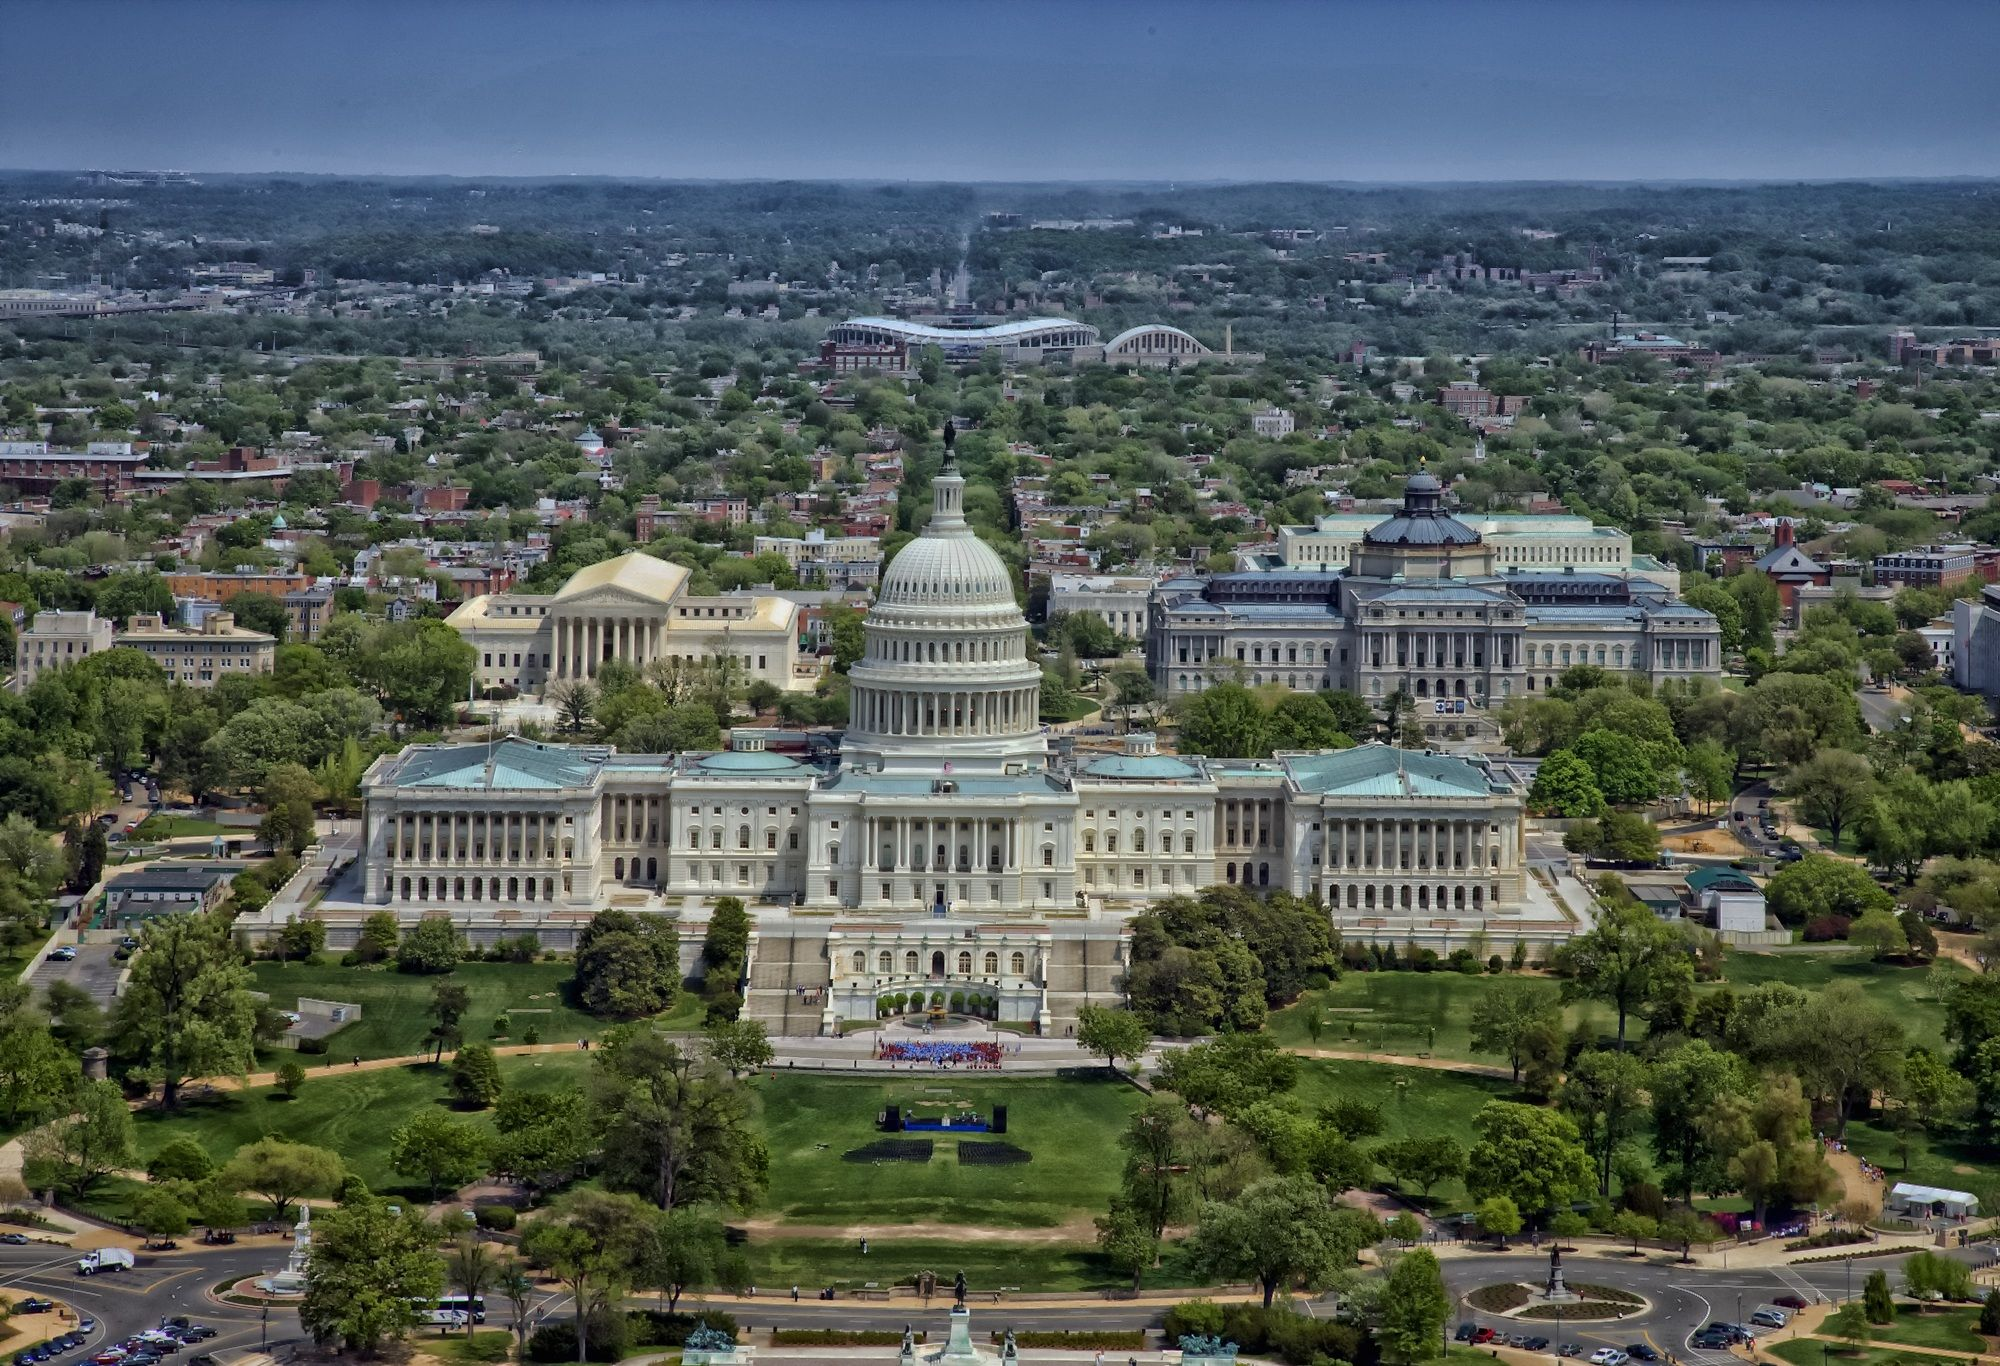 uj amerikai nemzeti muzeumok